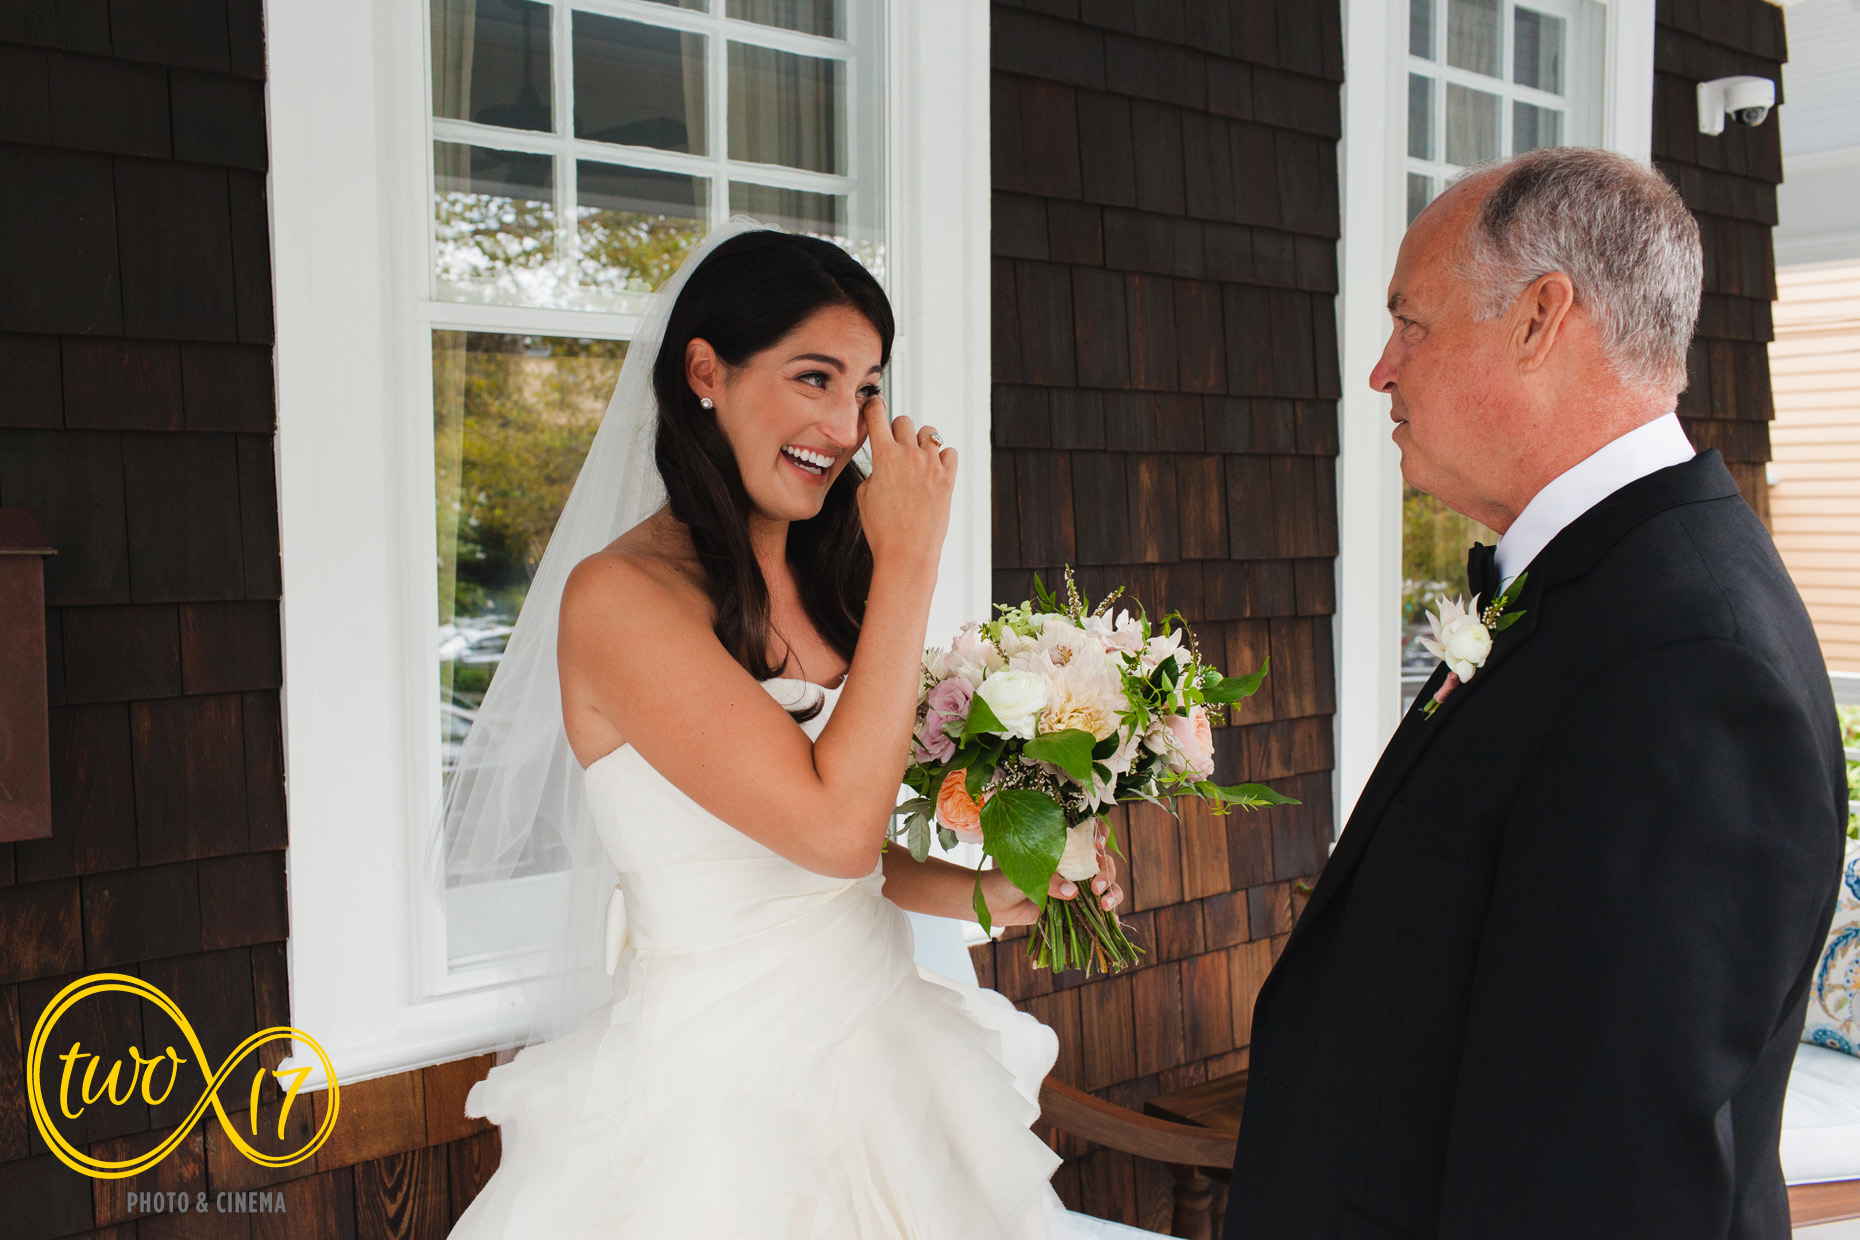 Cape May B&B Wedding